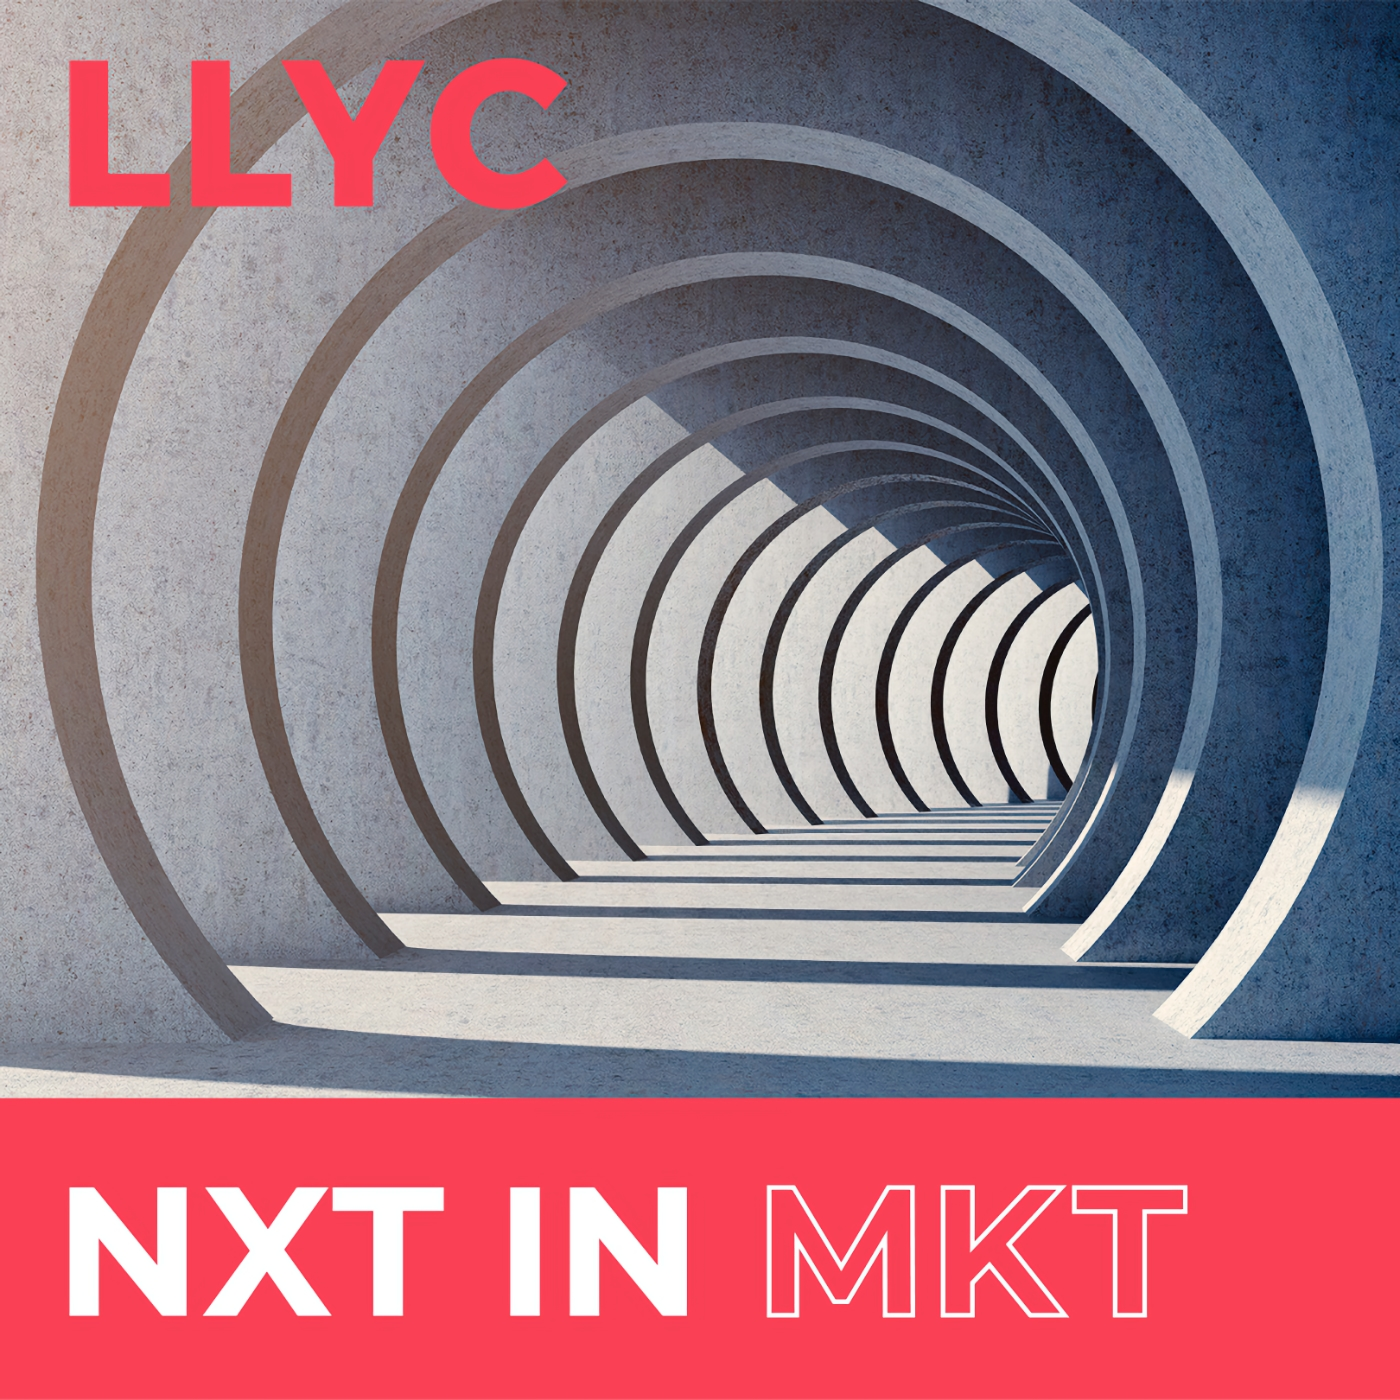 NXT in MKT